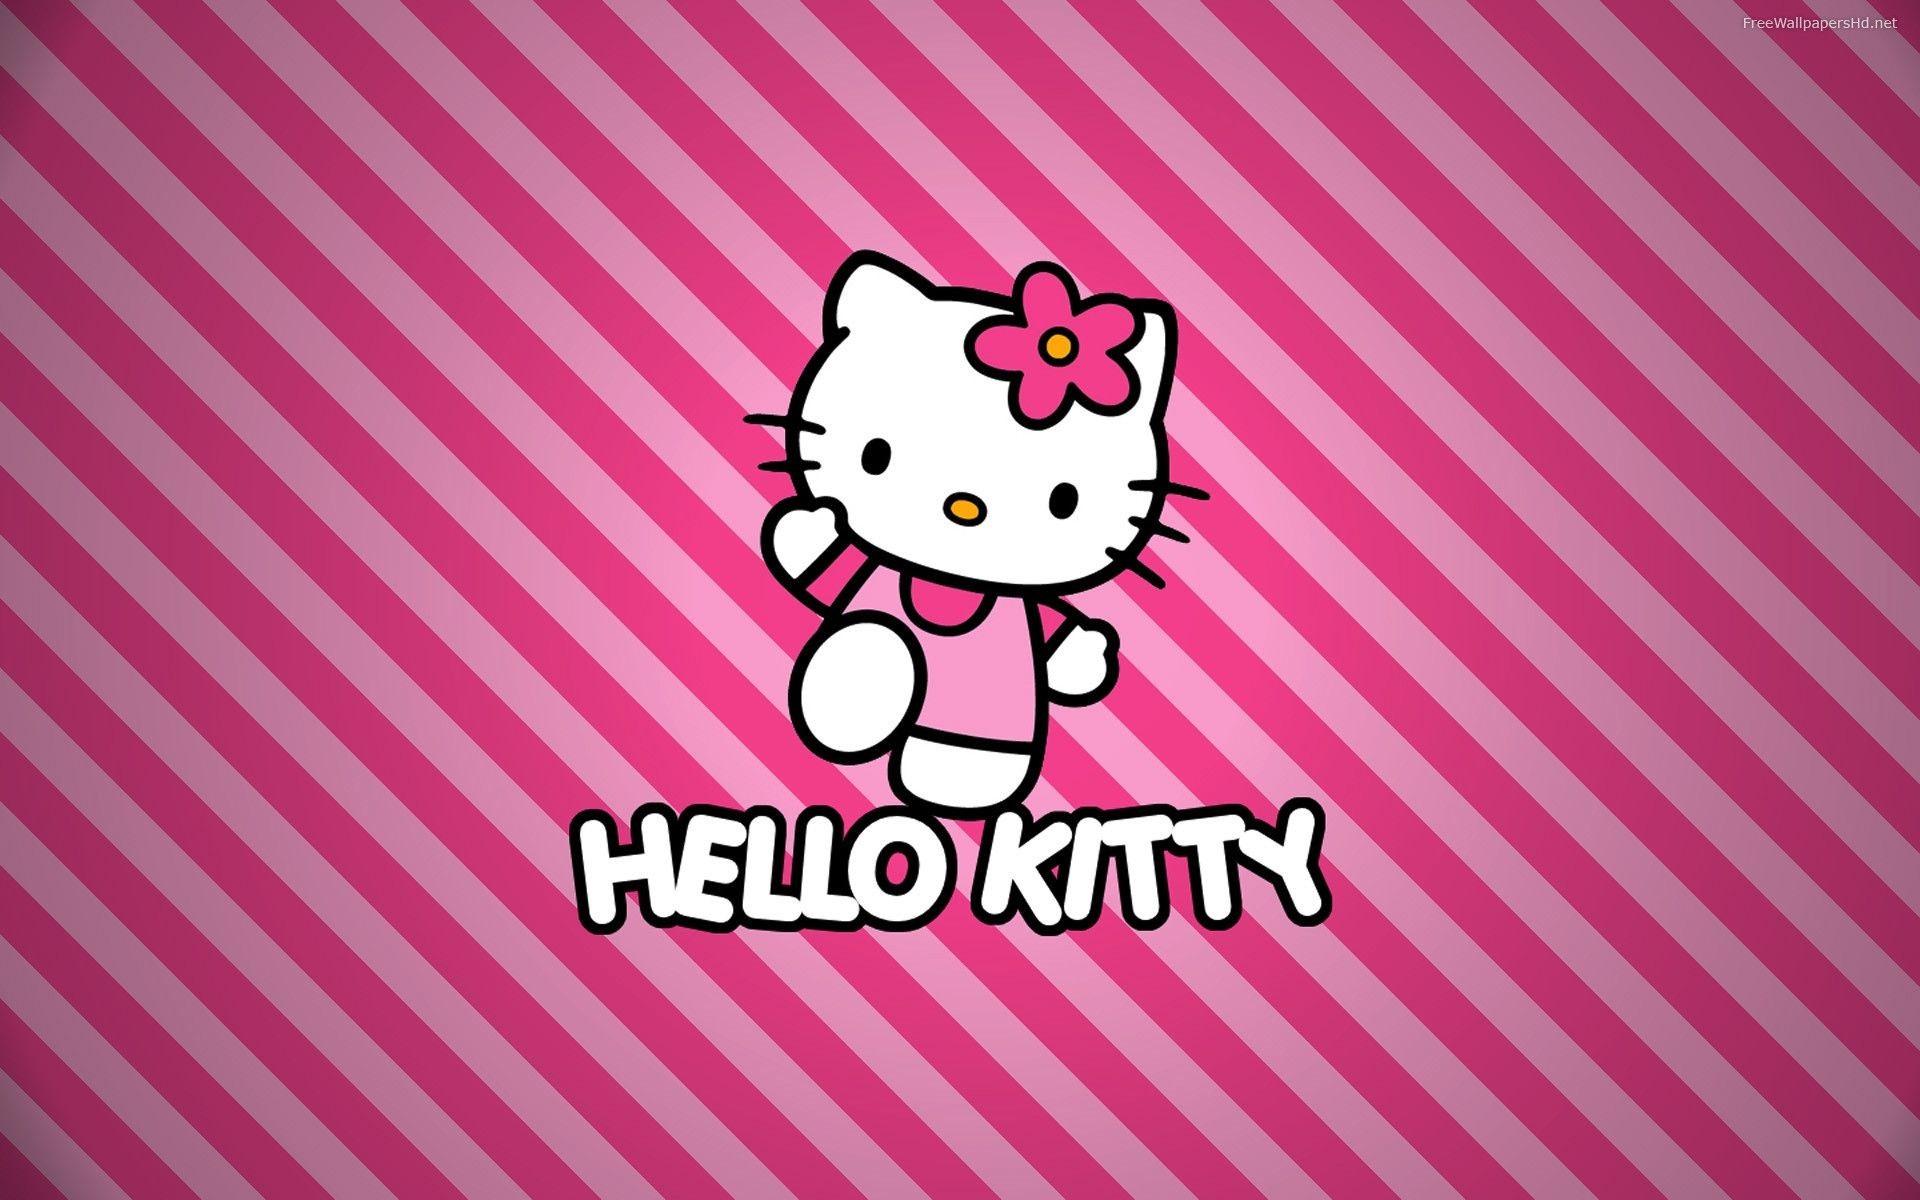 Hello Kitty Wallpaper 1920x1200 Photos